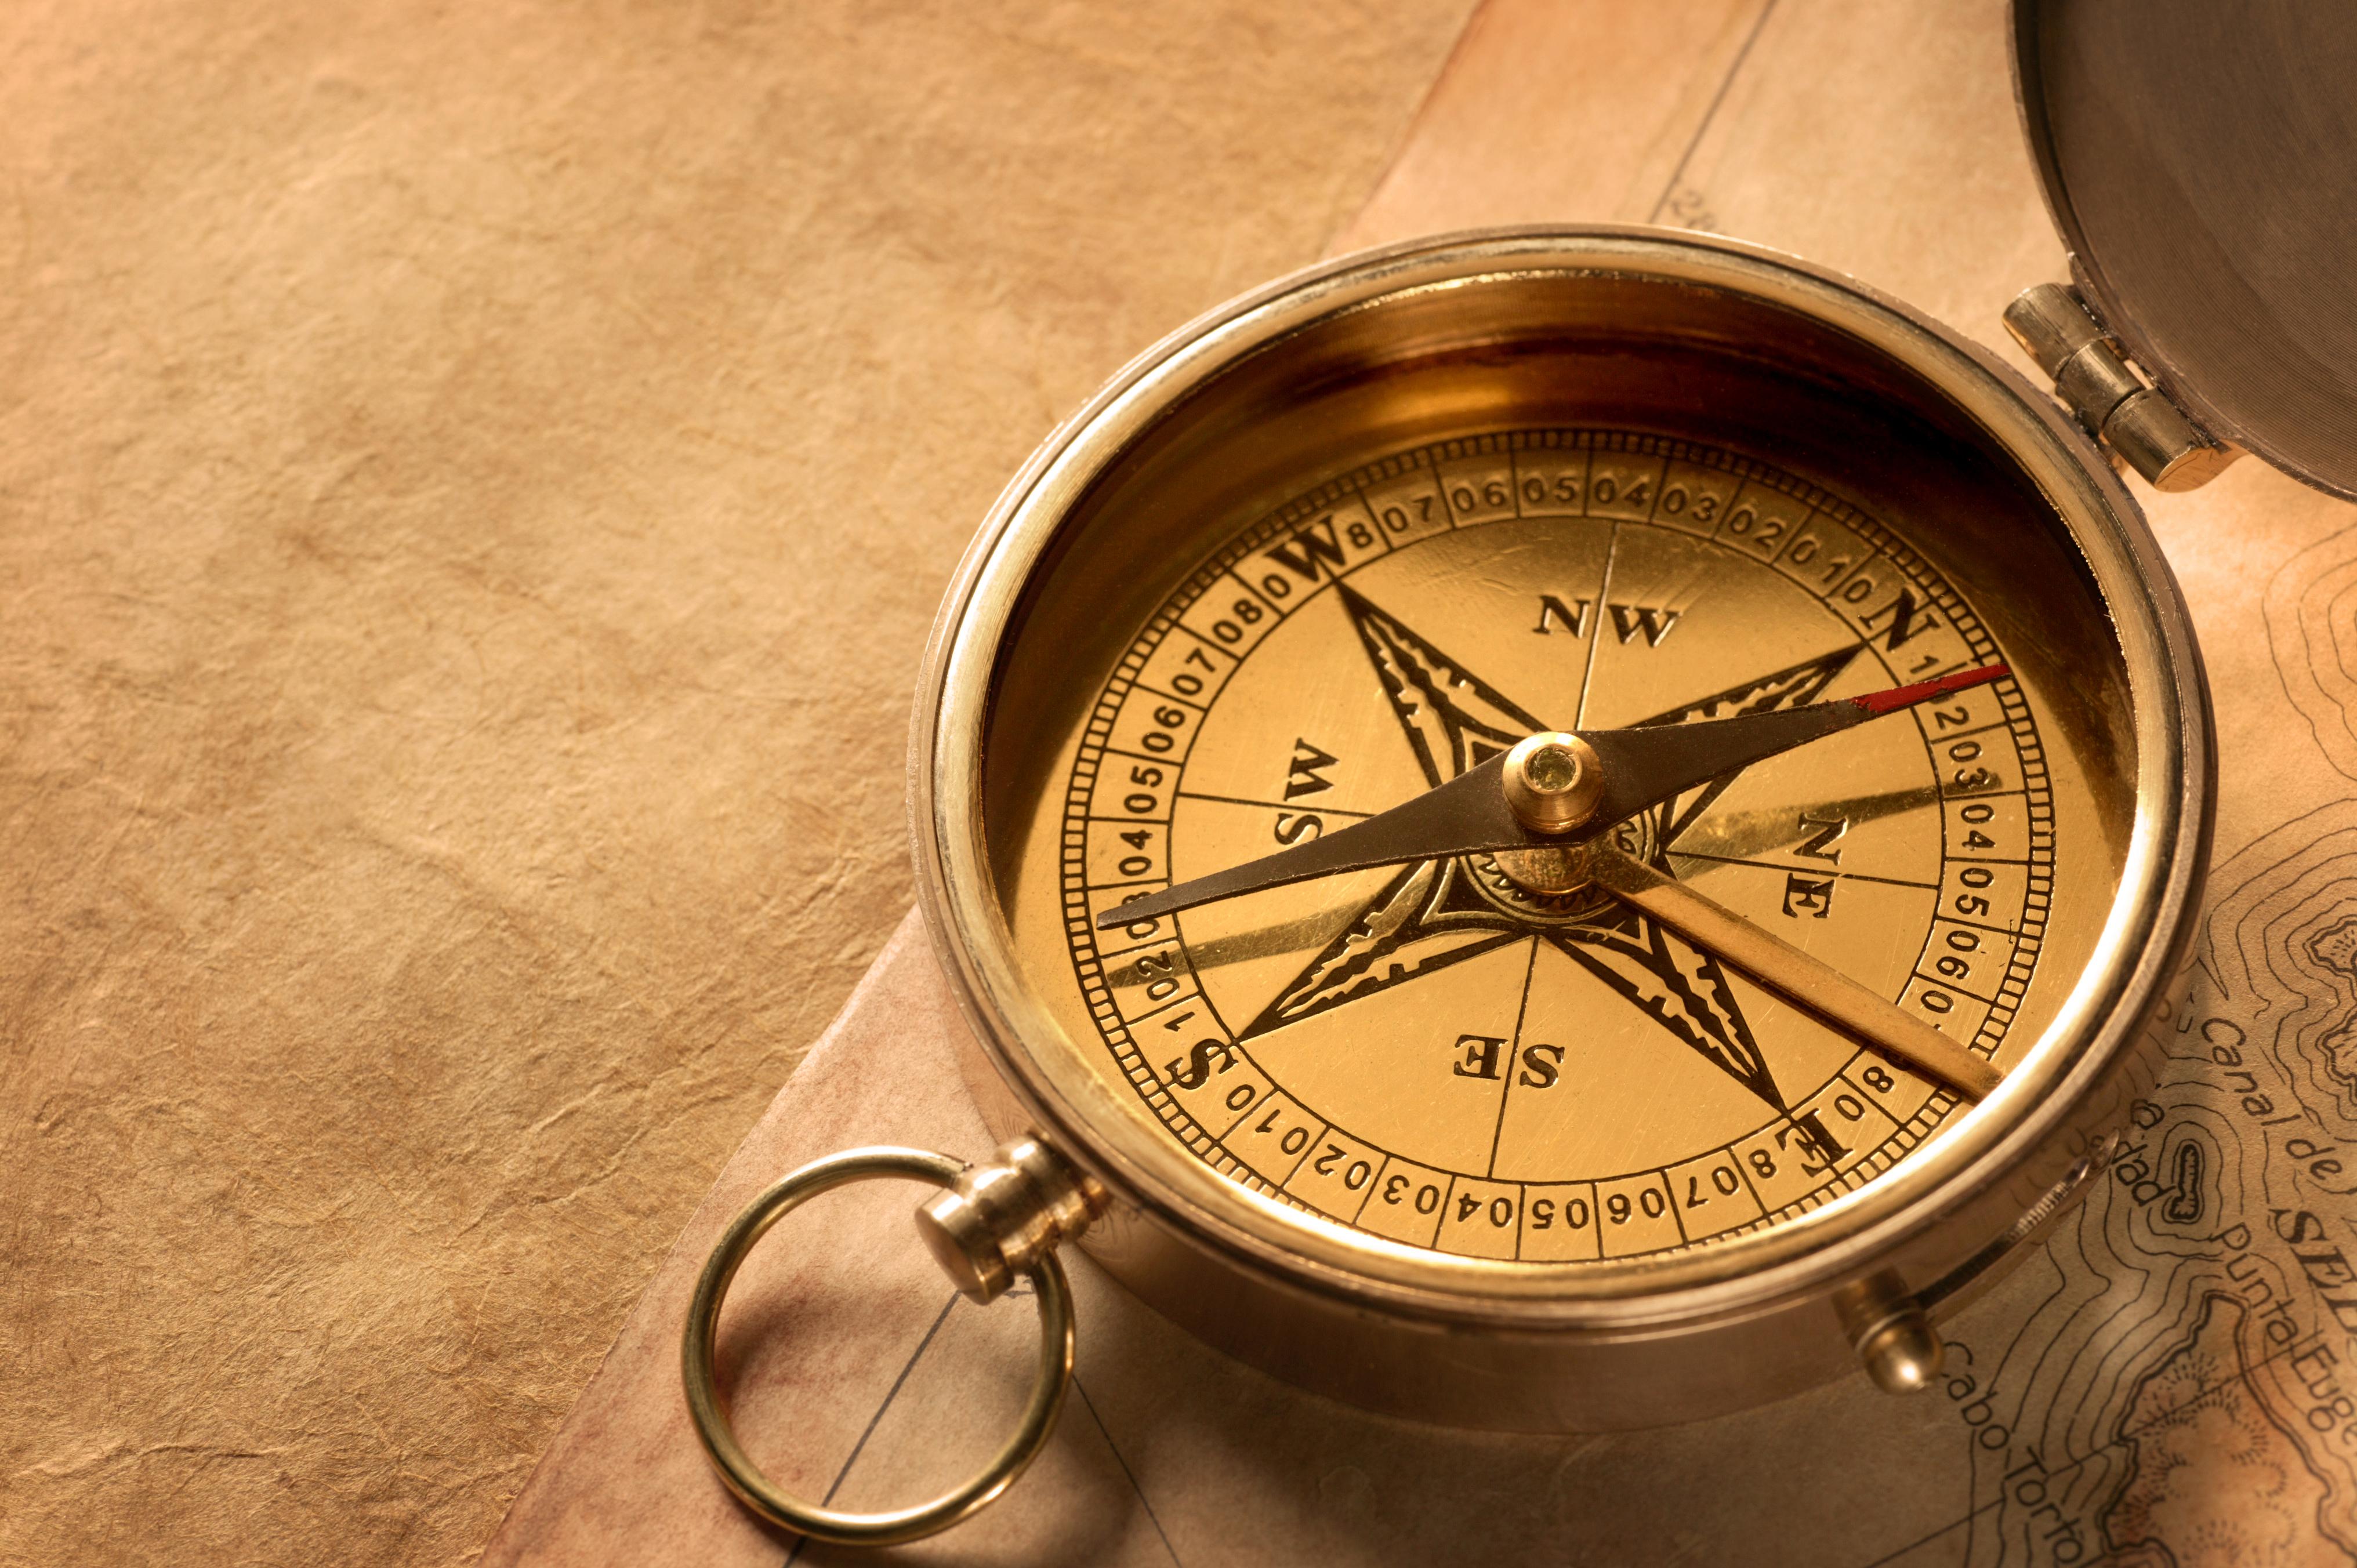 Average Compass Group Salary